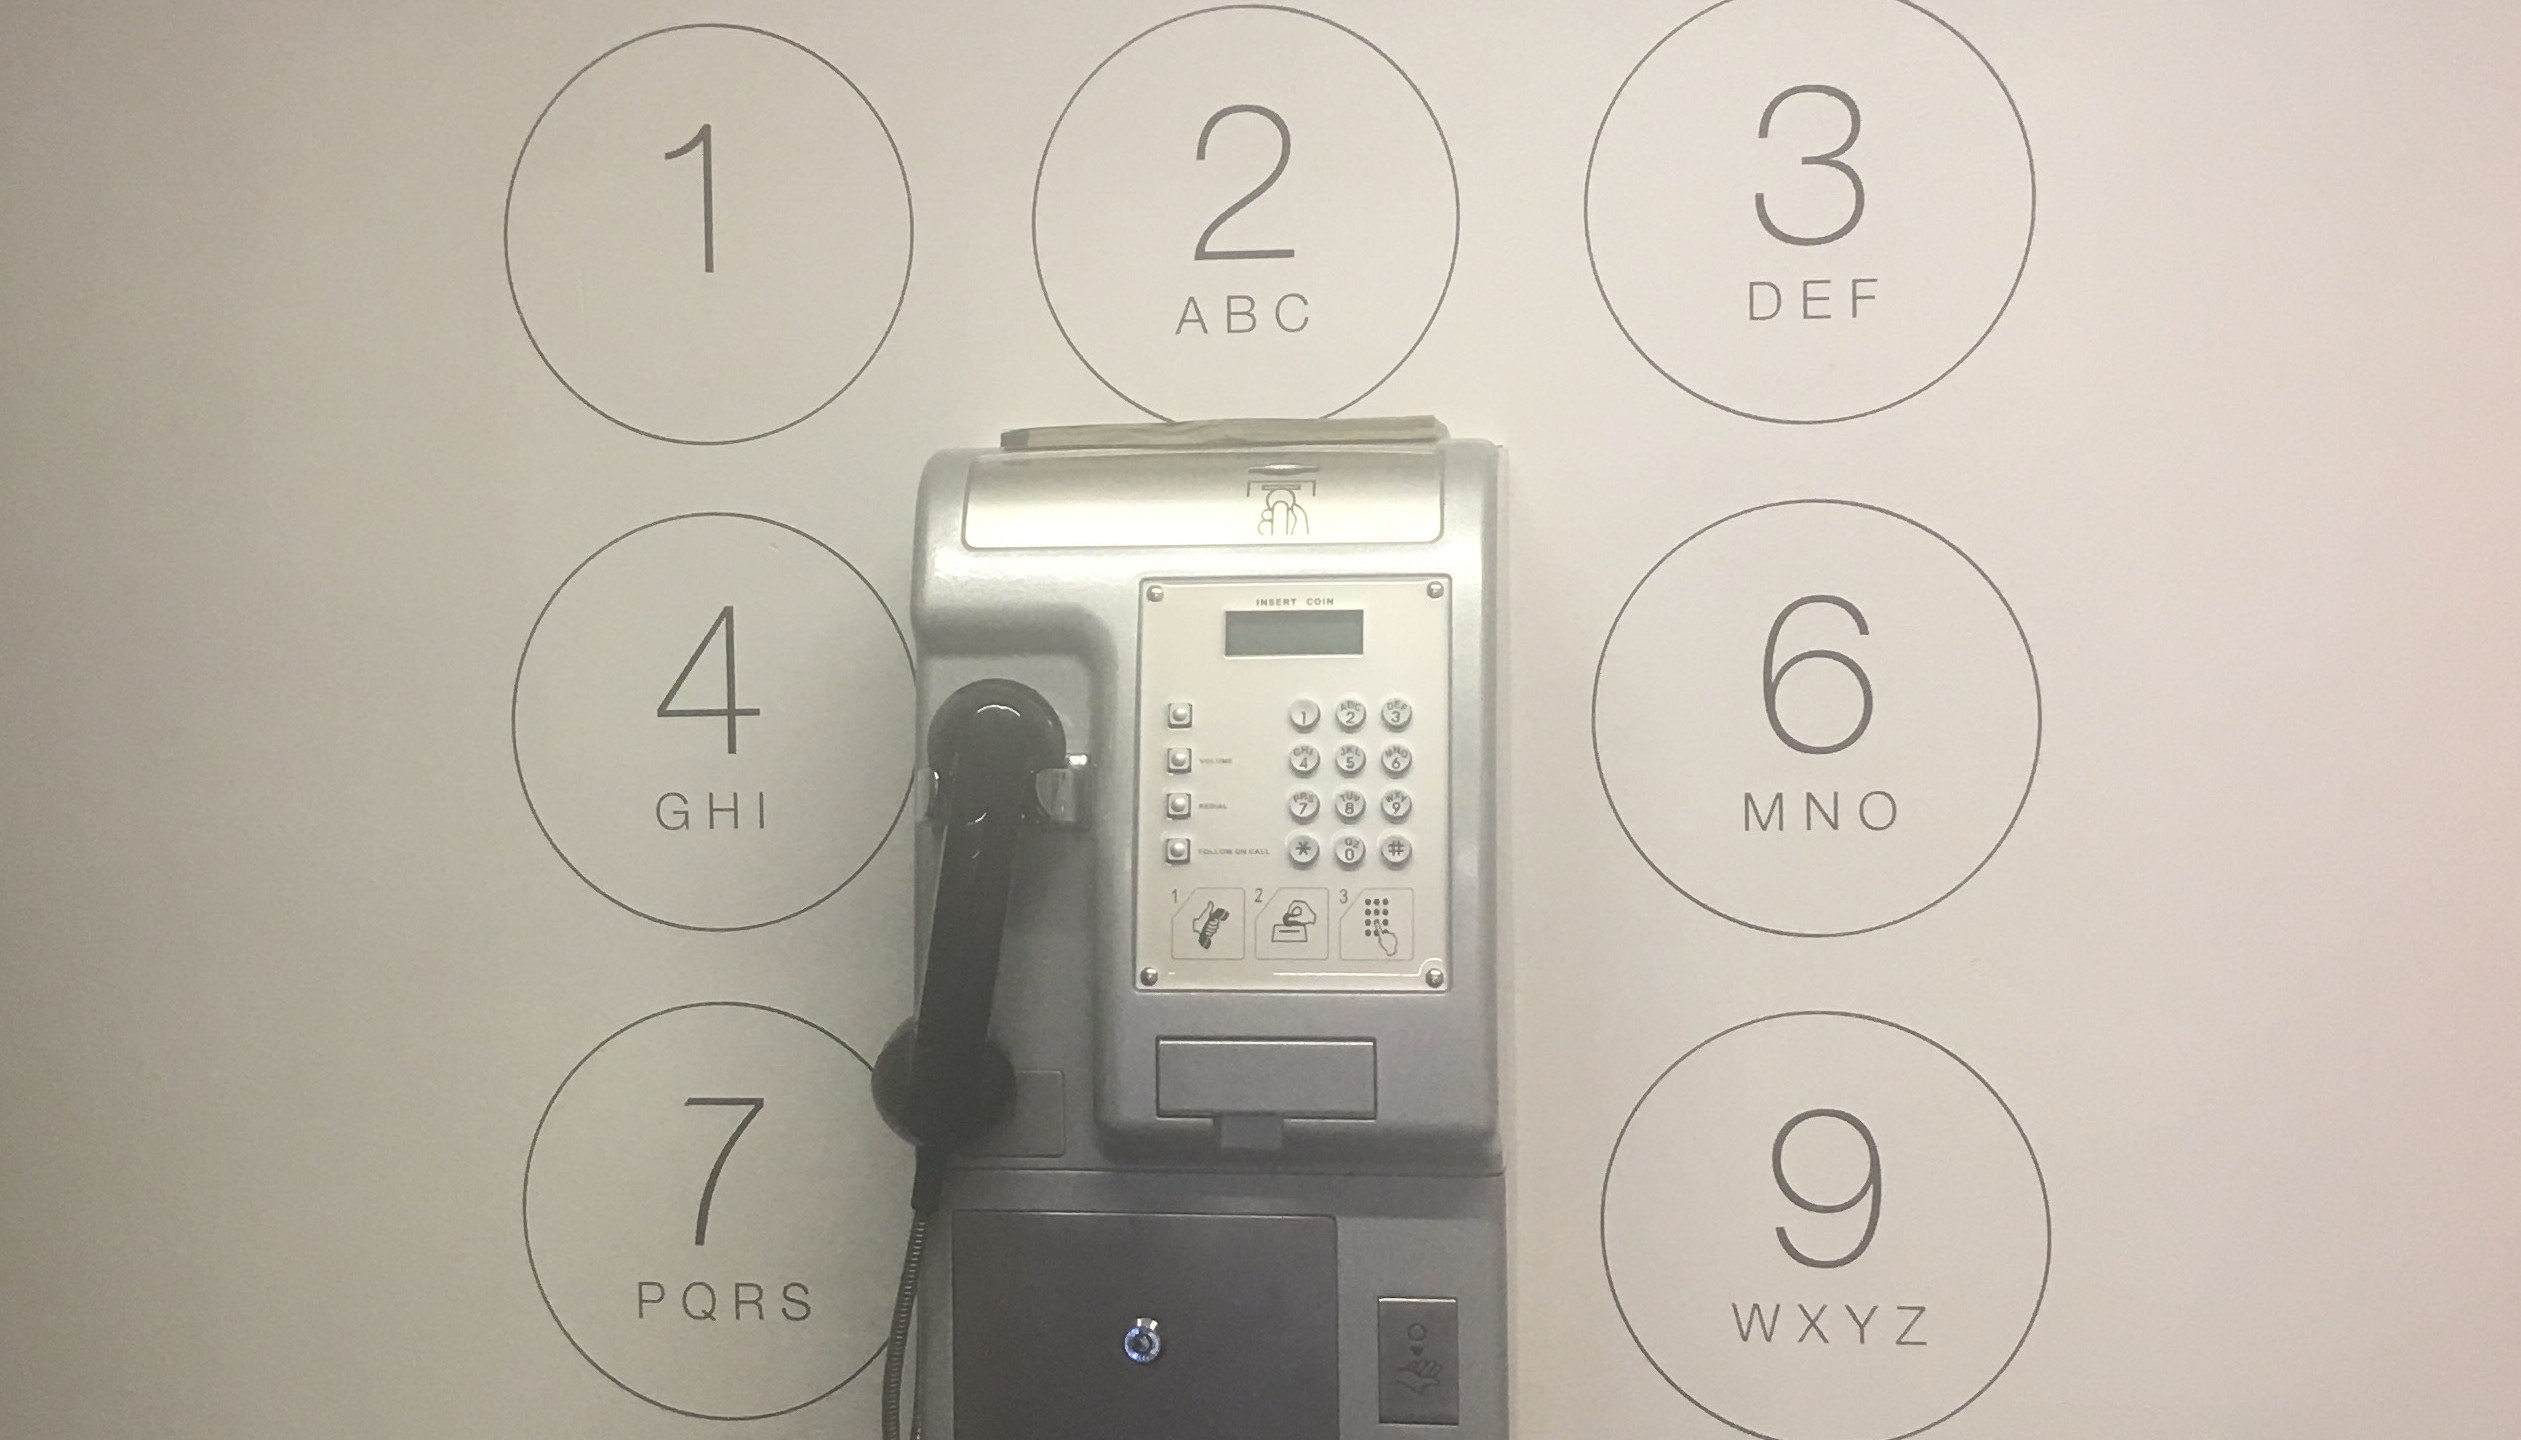 Hostel Wall Phone